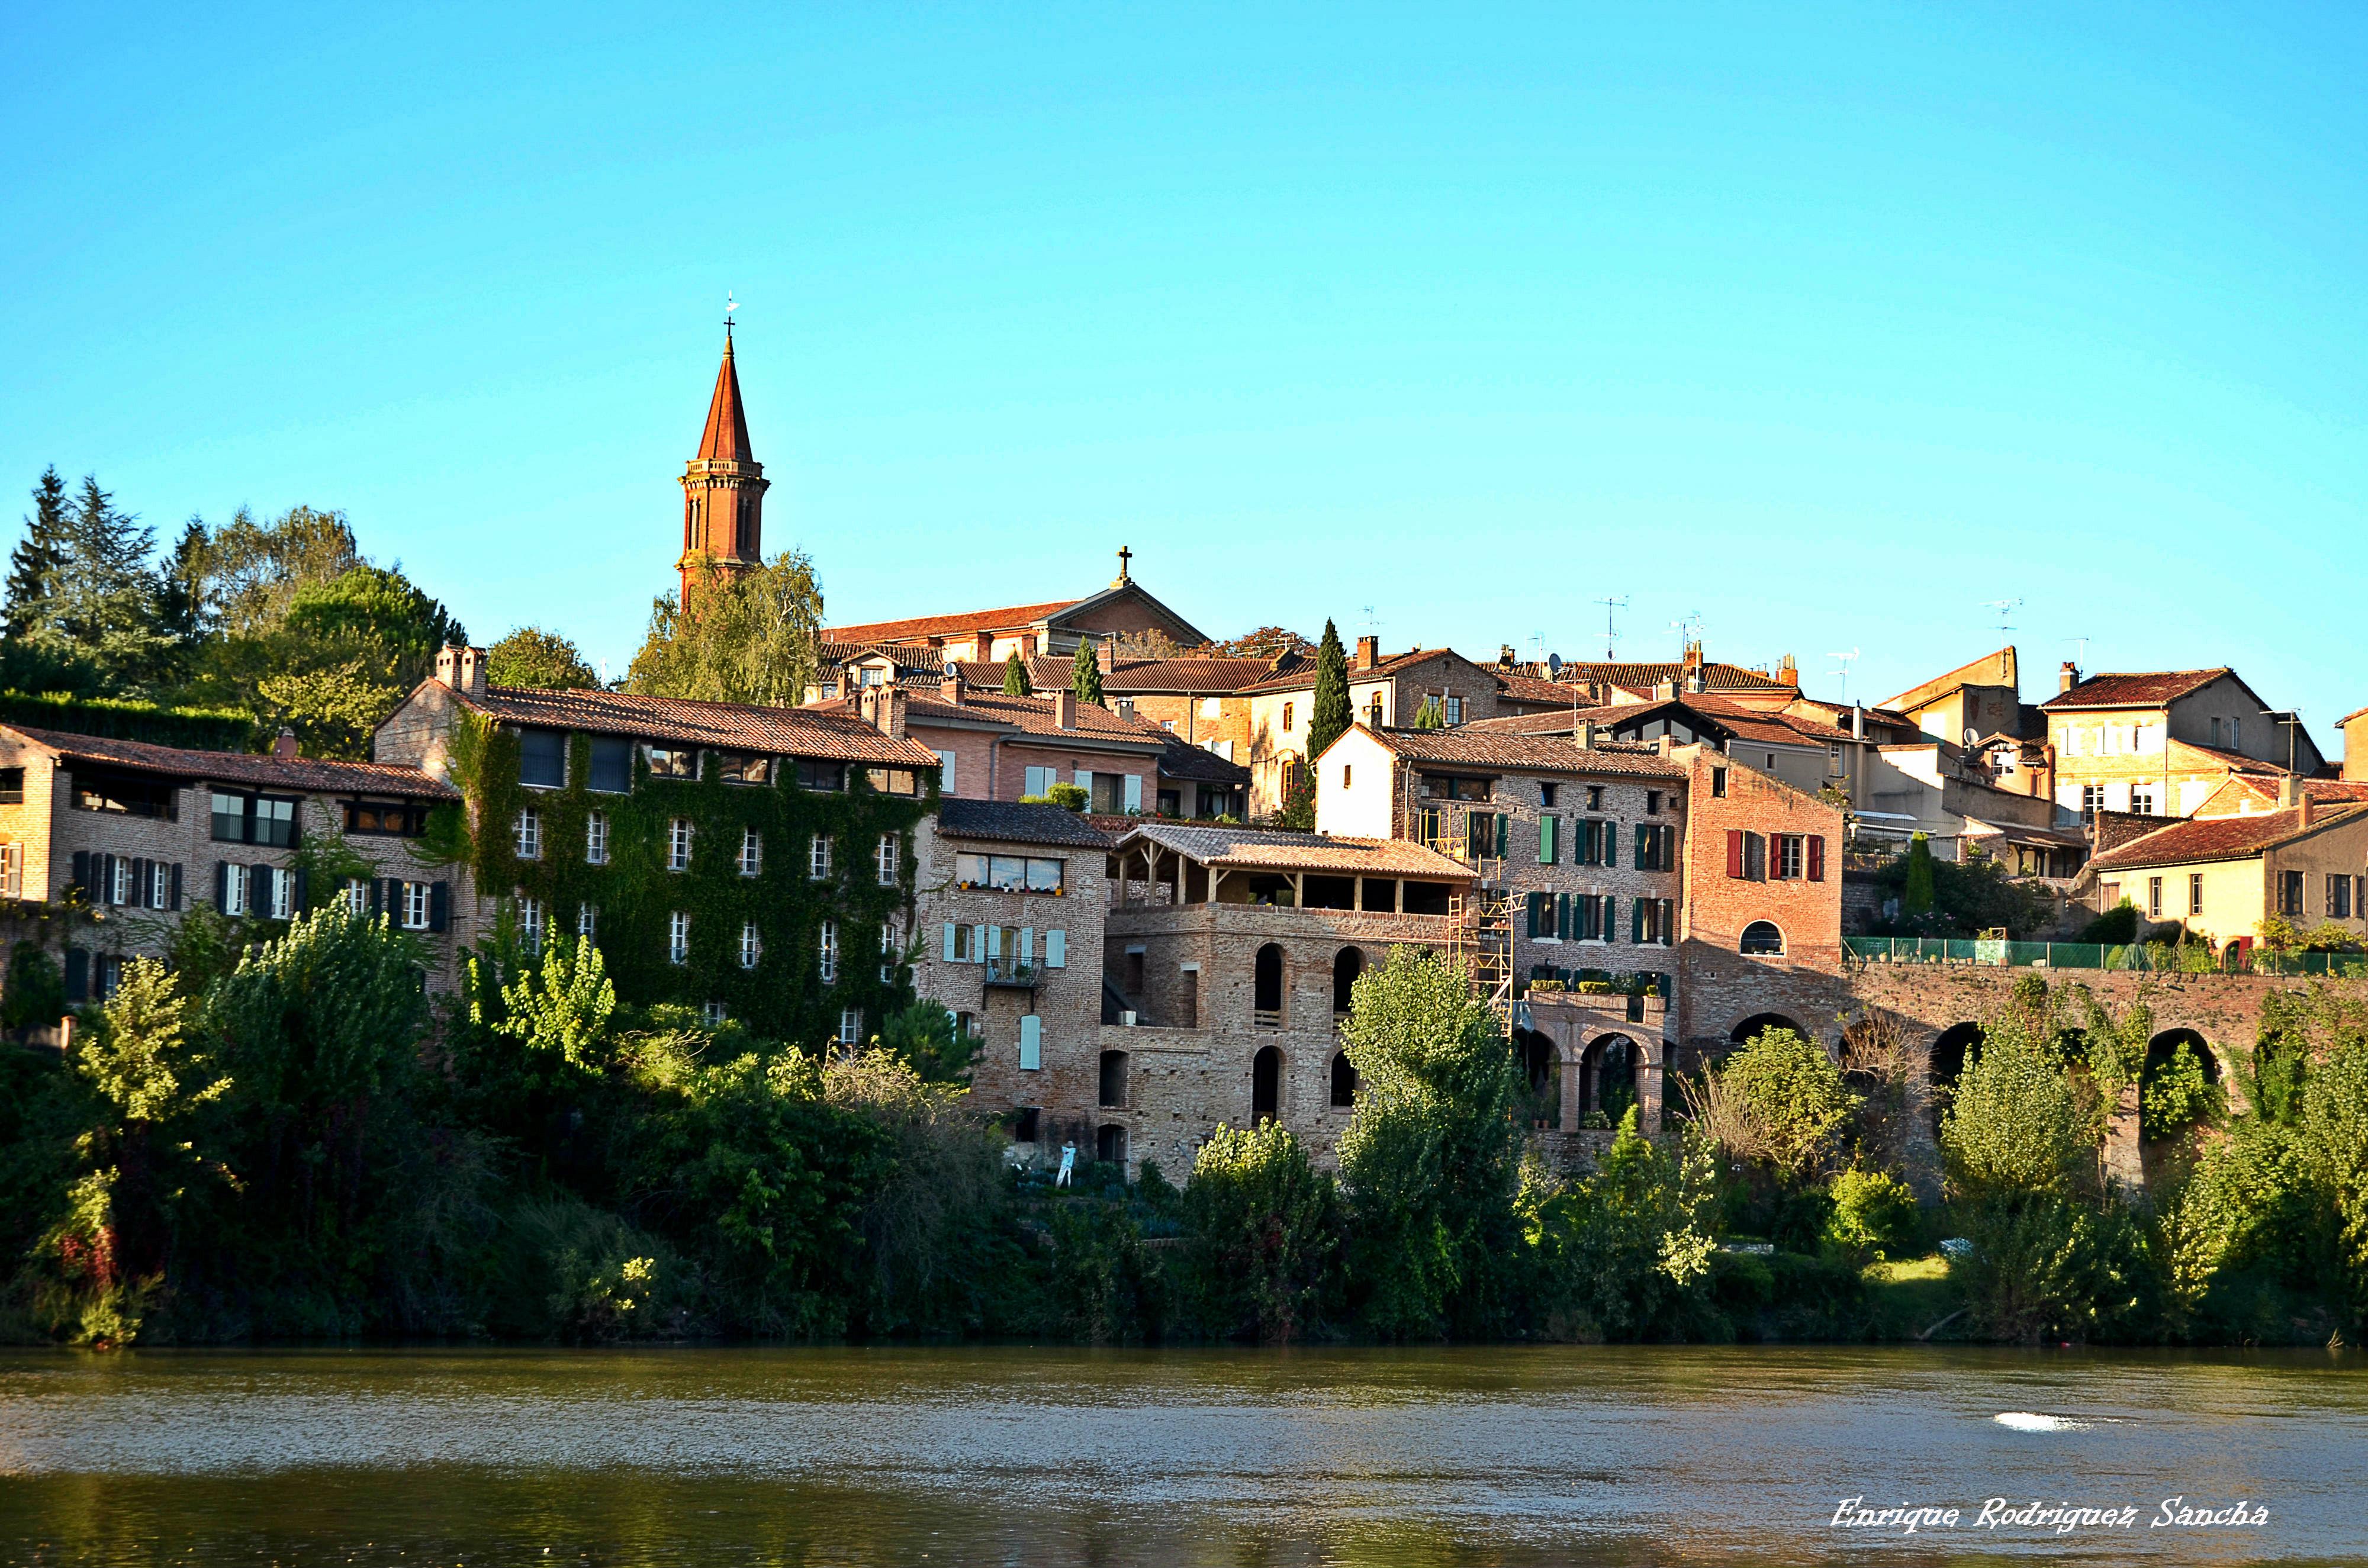 Crónica del Viaje de Prácticas a Toulouse (por Enrique Rodríguez)